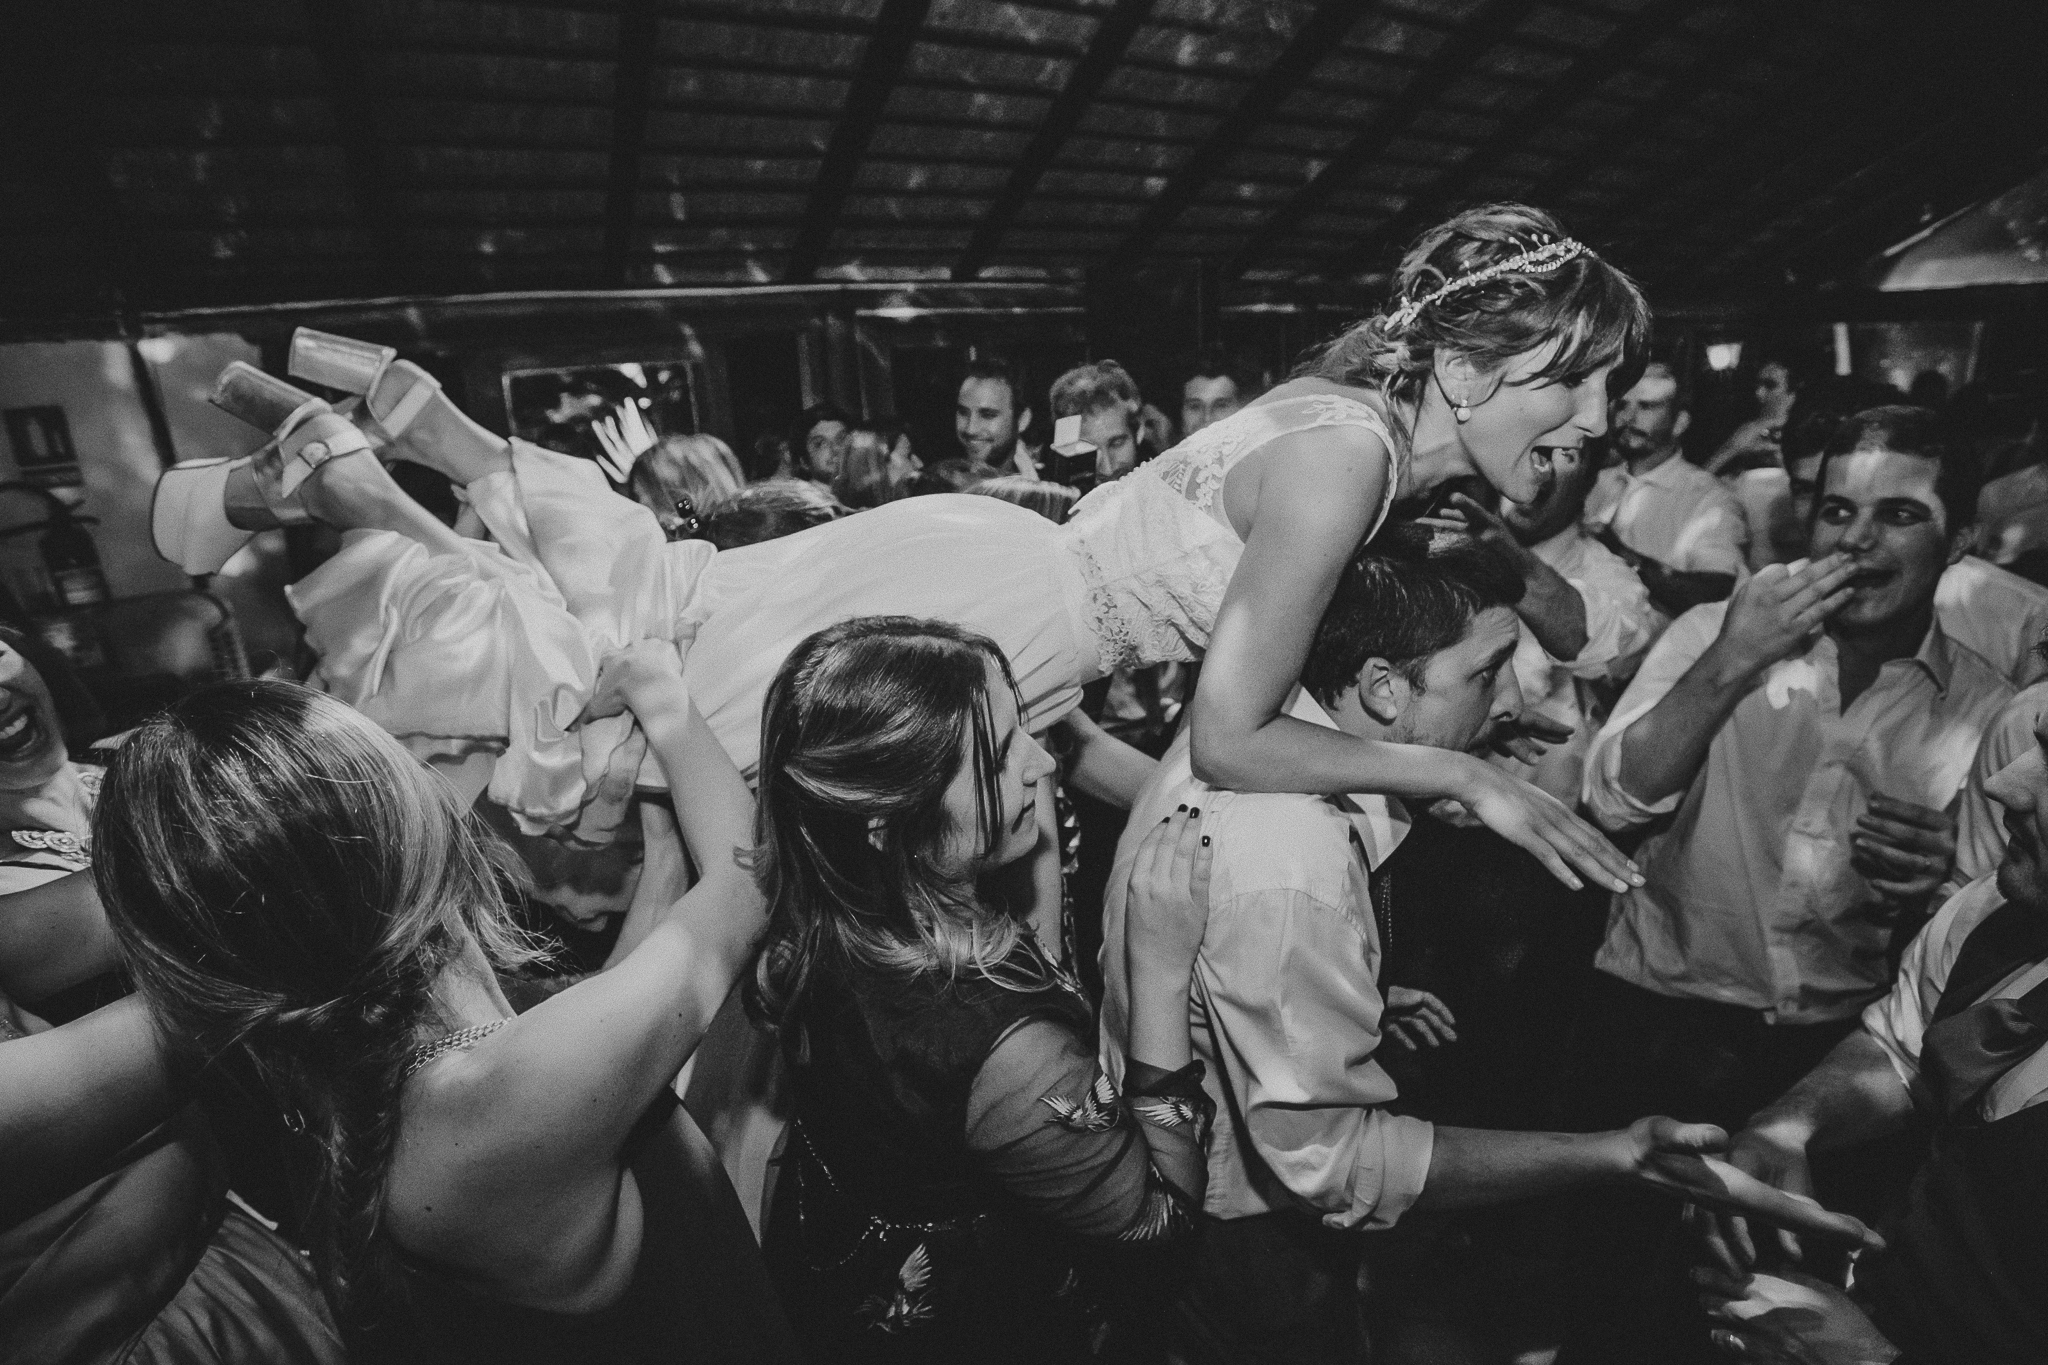 boda en lacrosse - fotografía espontánea de bodas - fotos de boda uruguay - P&I09